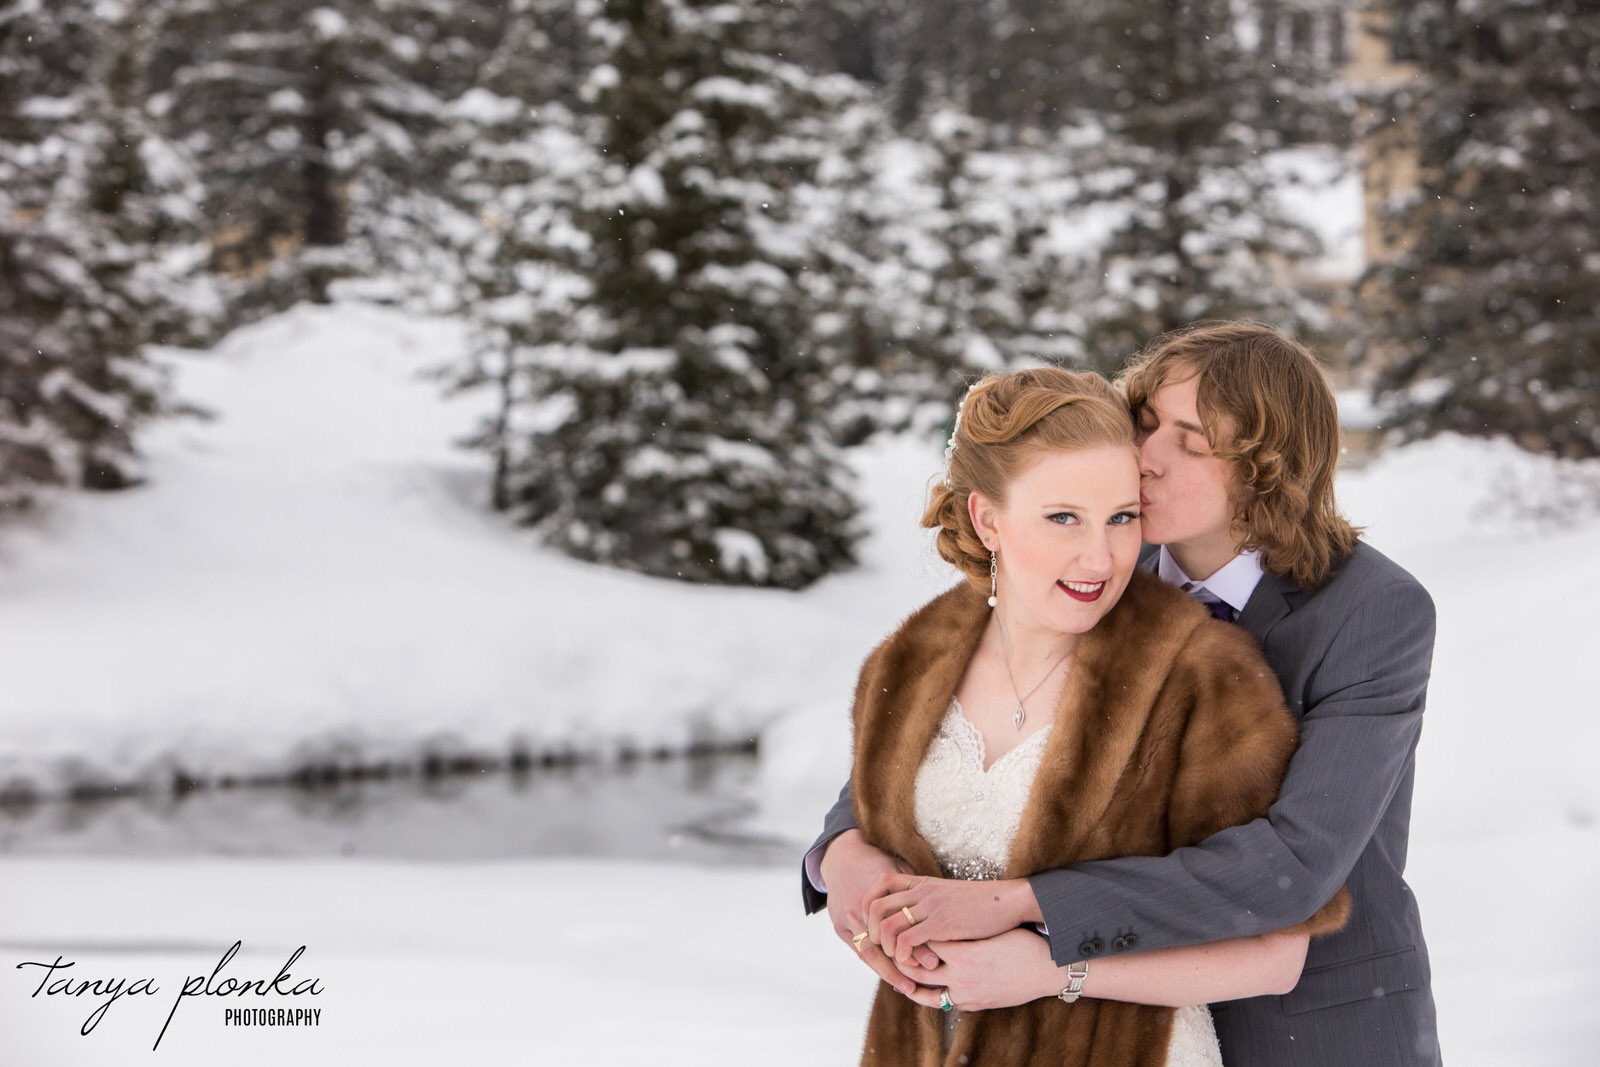 groom kissing bride on cheek at snowy Lake Louise winter wedding